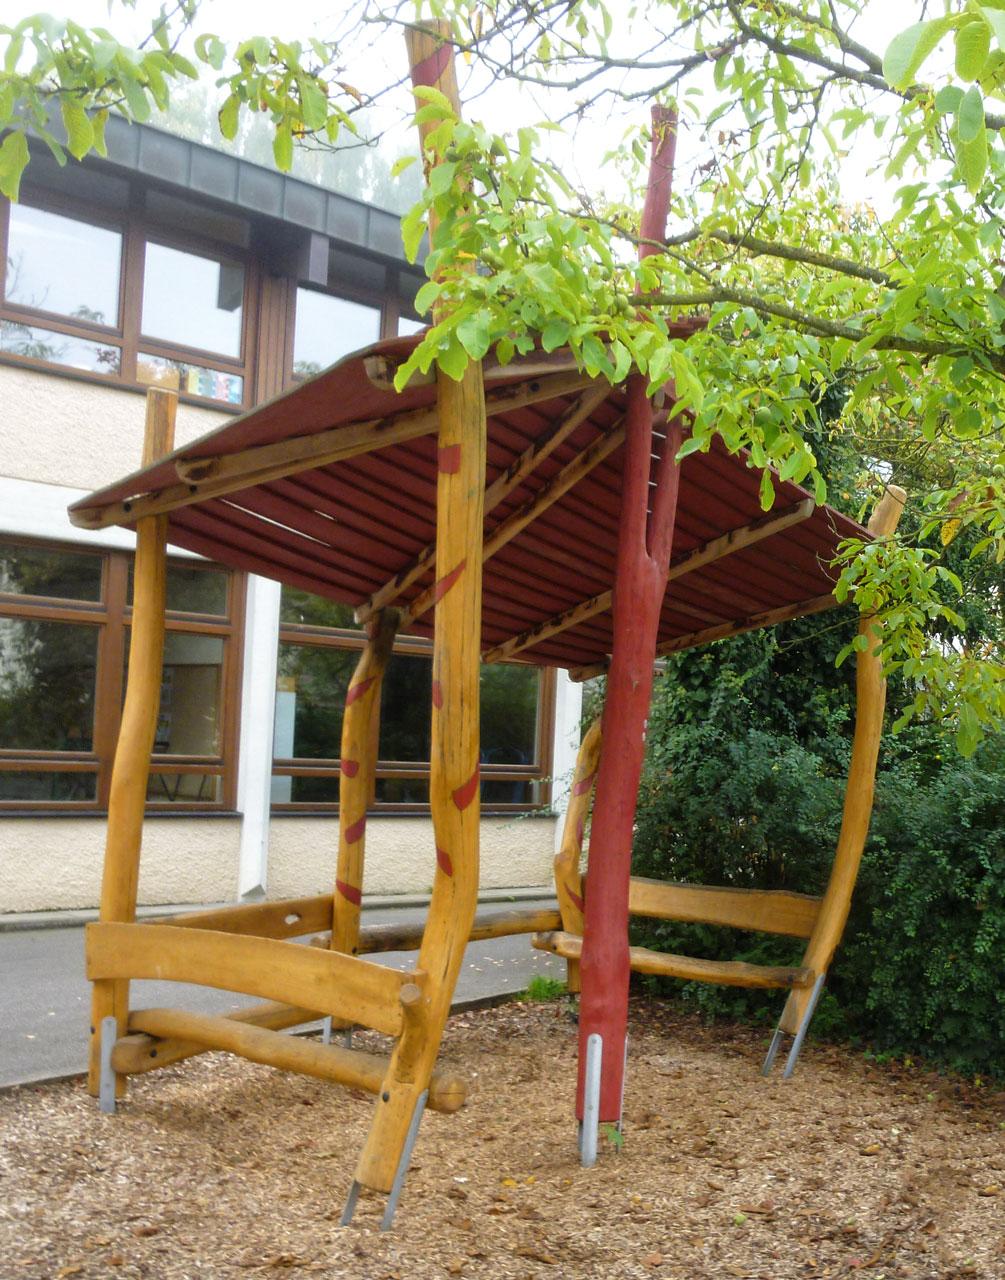 E 17 Pavillon Treffpunkt Neckarsulm